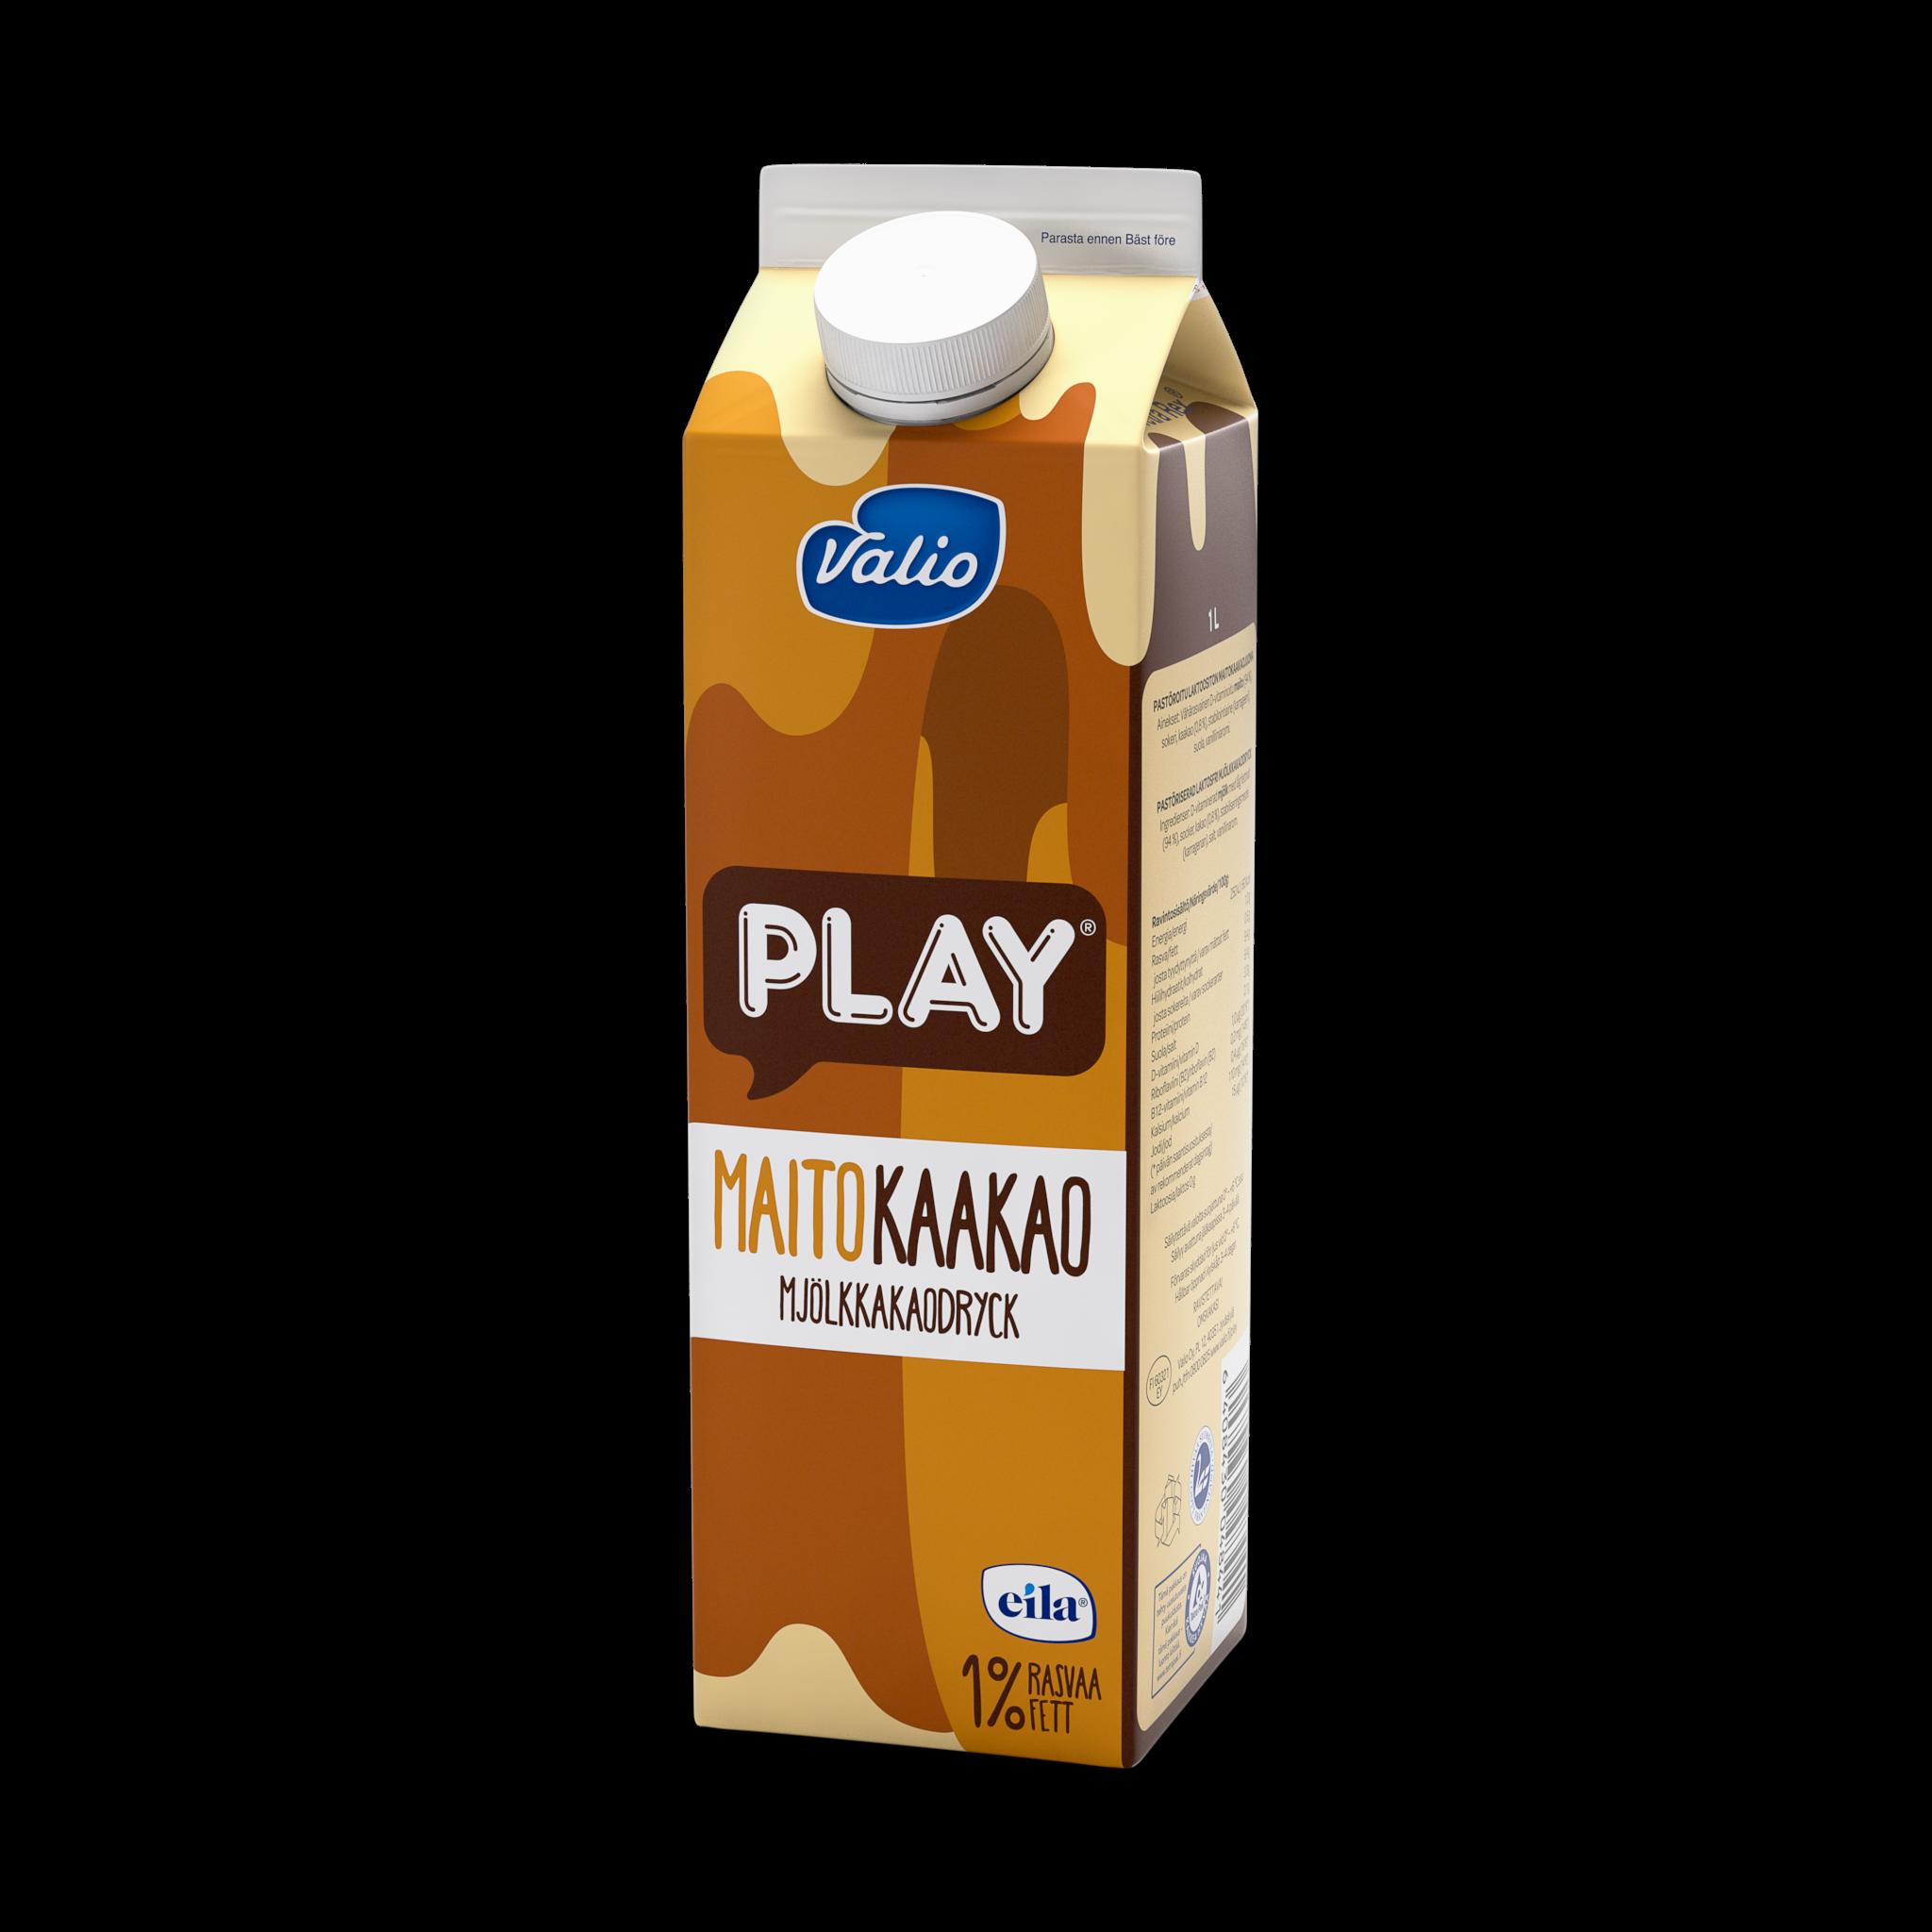 Valio Play® maitokaakaojuoma